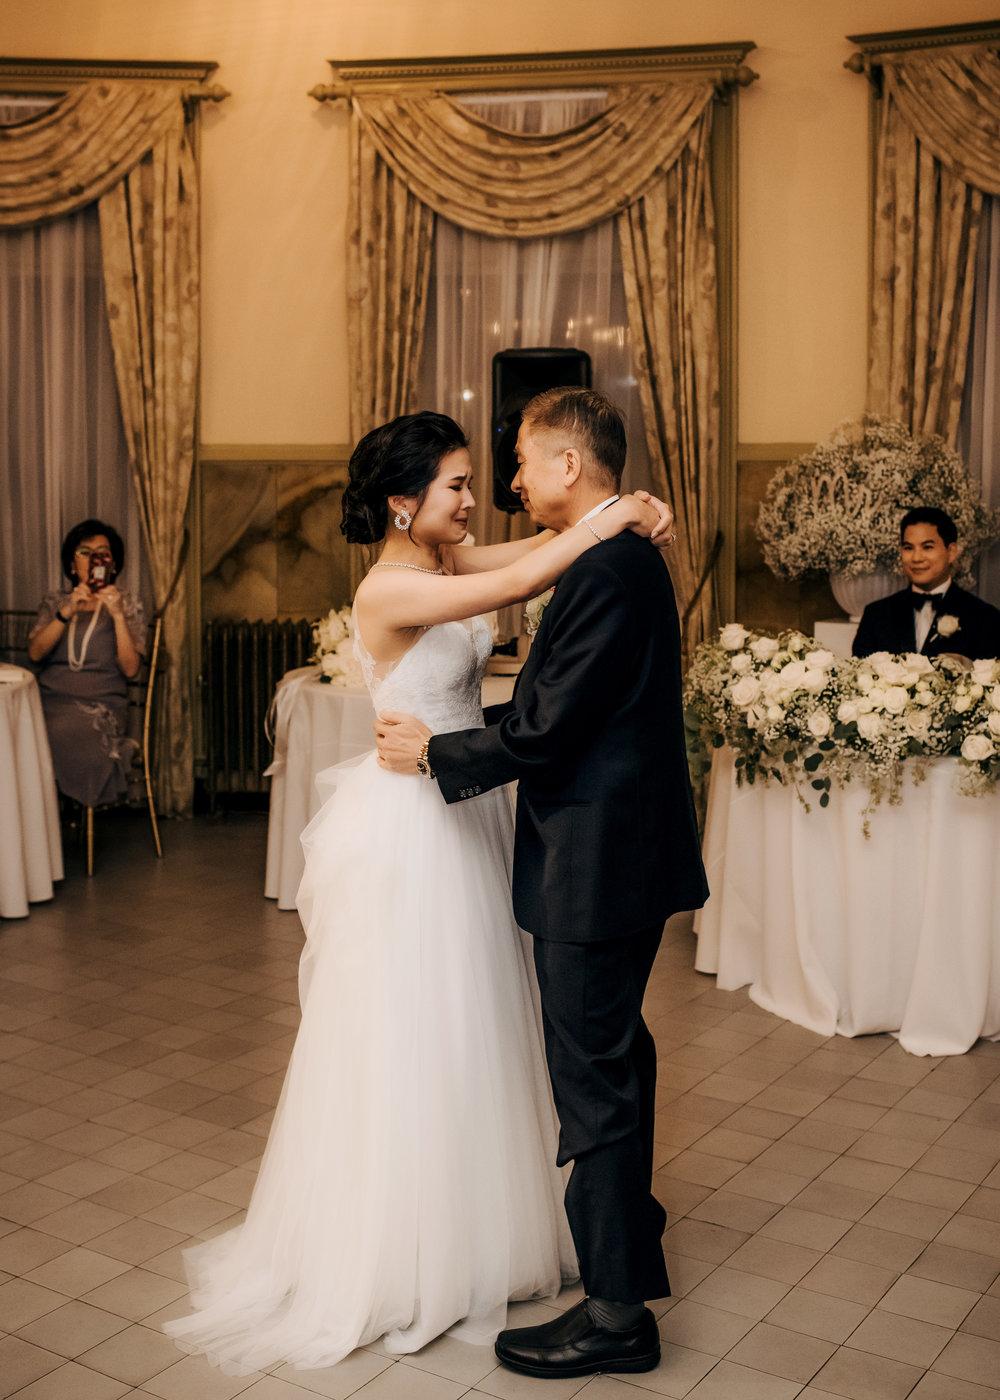 Turchin_20181014_Prim-Jacky-Wedding_456.jpg